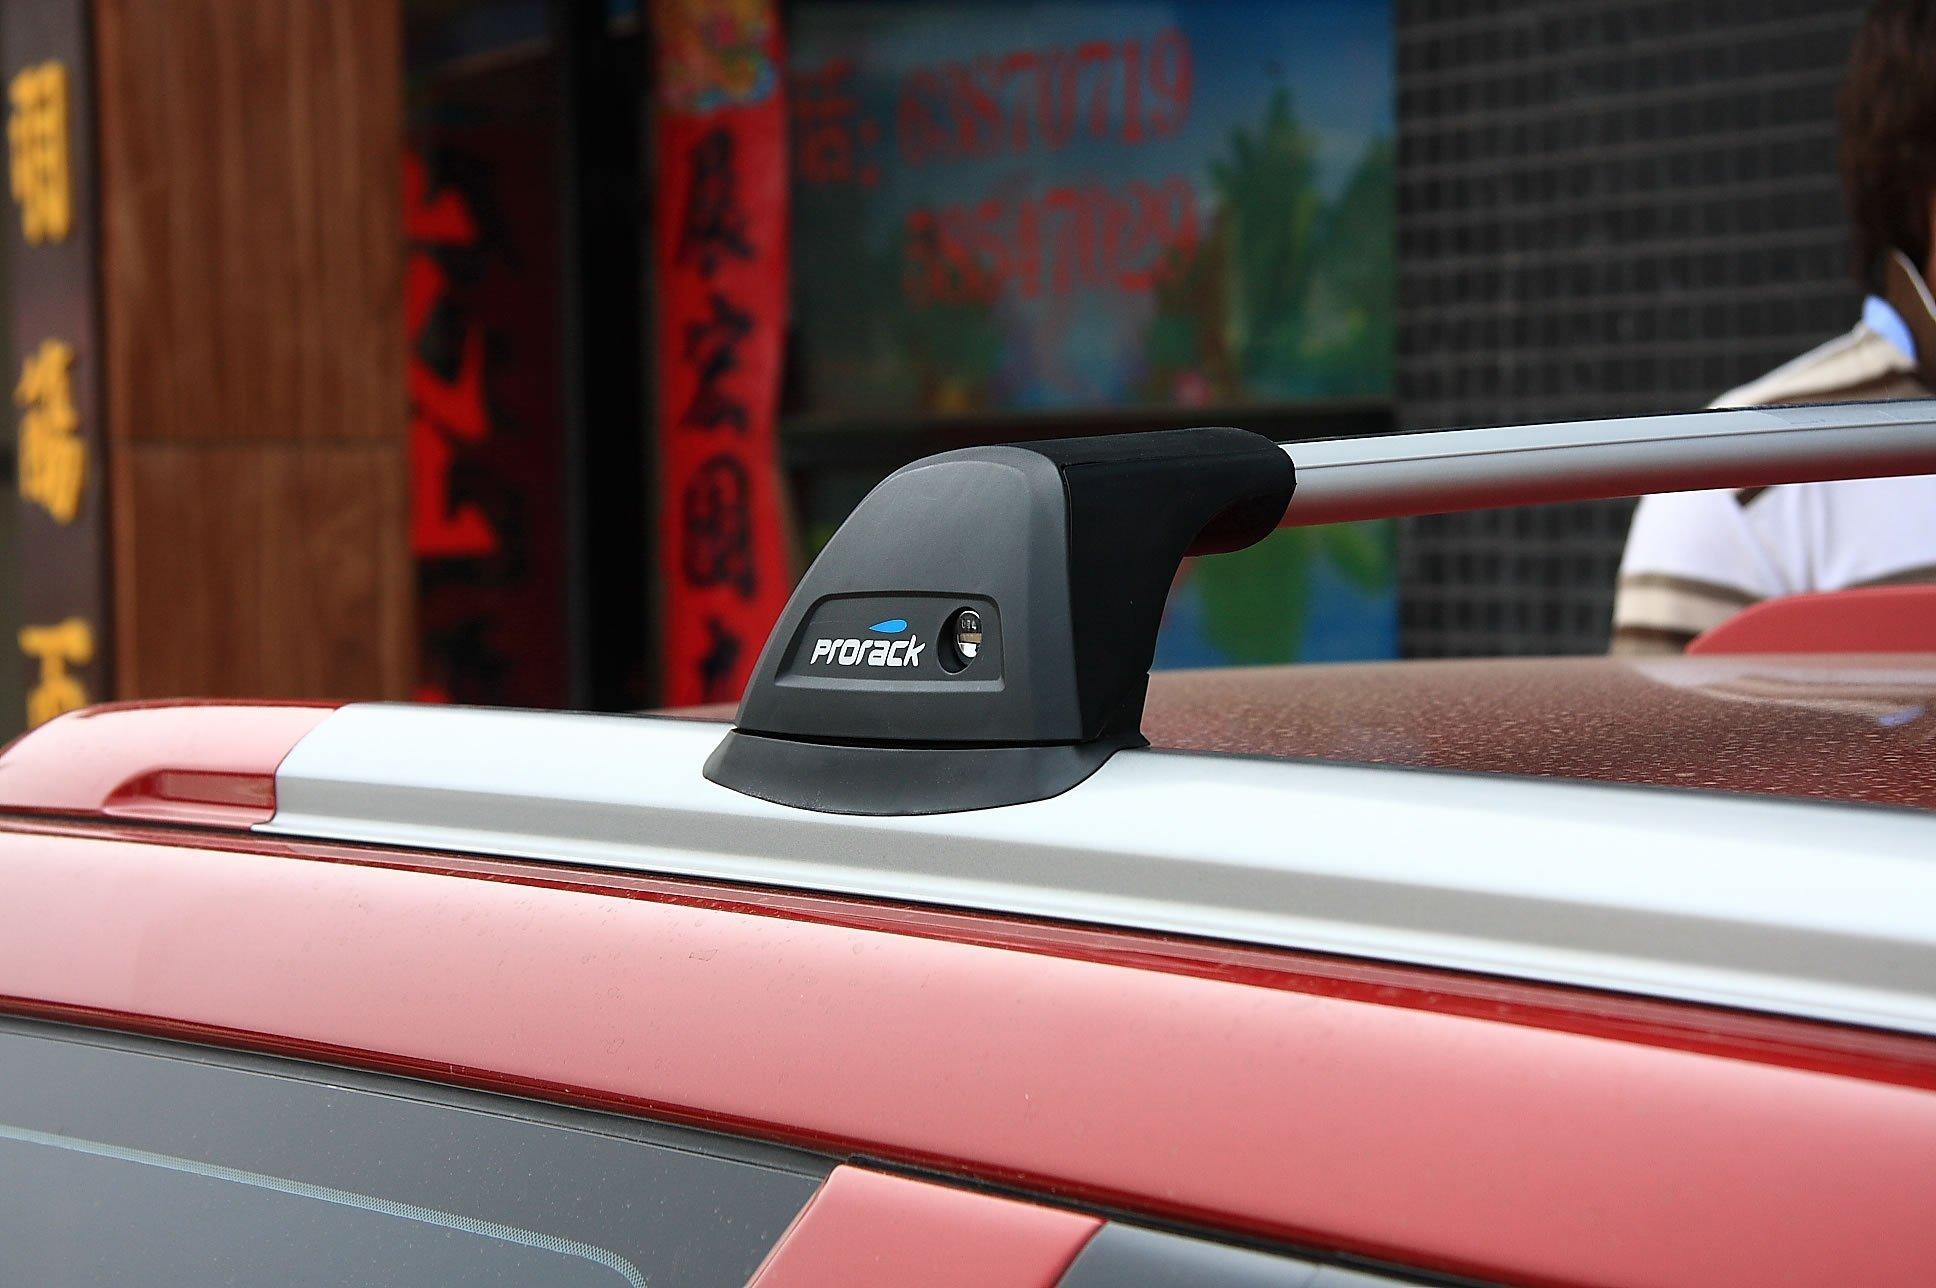 багажник Subaru Forester автомобиля багажник багажник железнодорожных путешествий прохладно стойки prorack whispbar